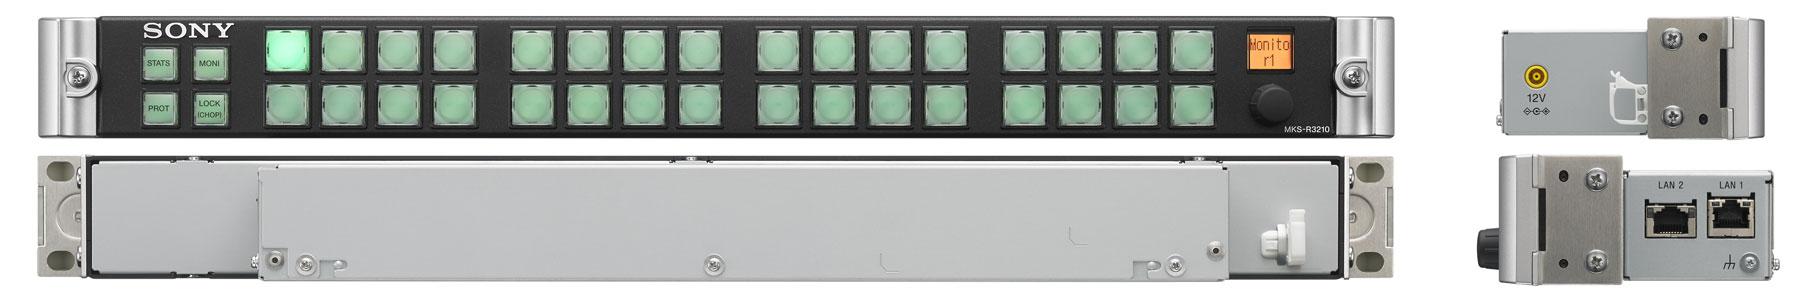 MKSR3210